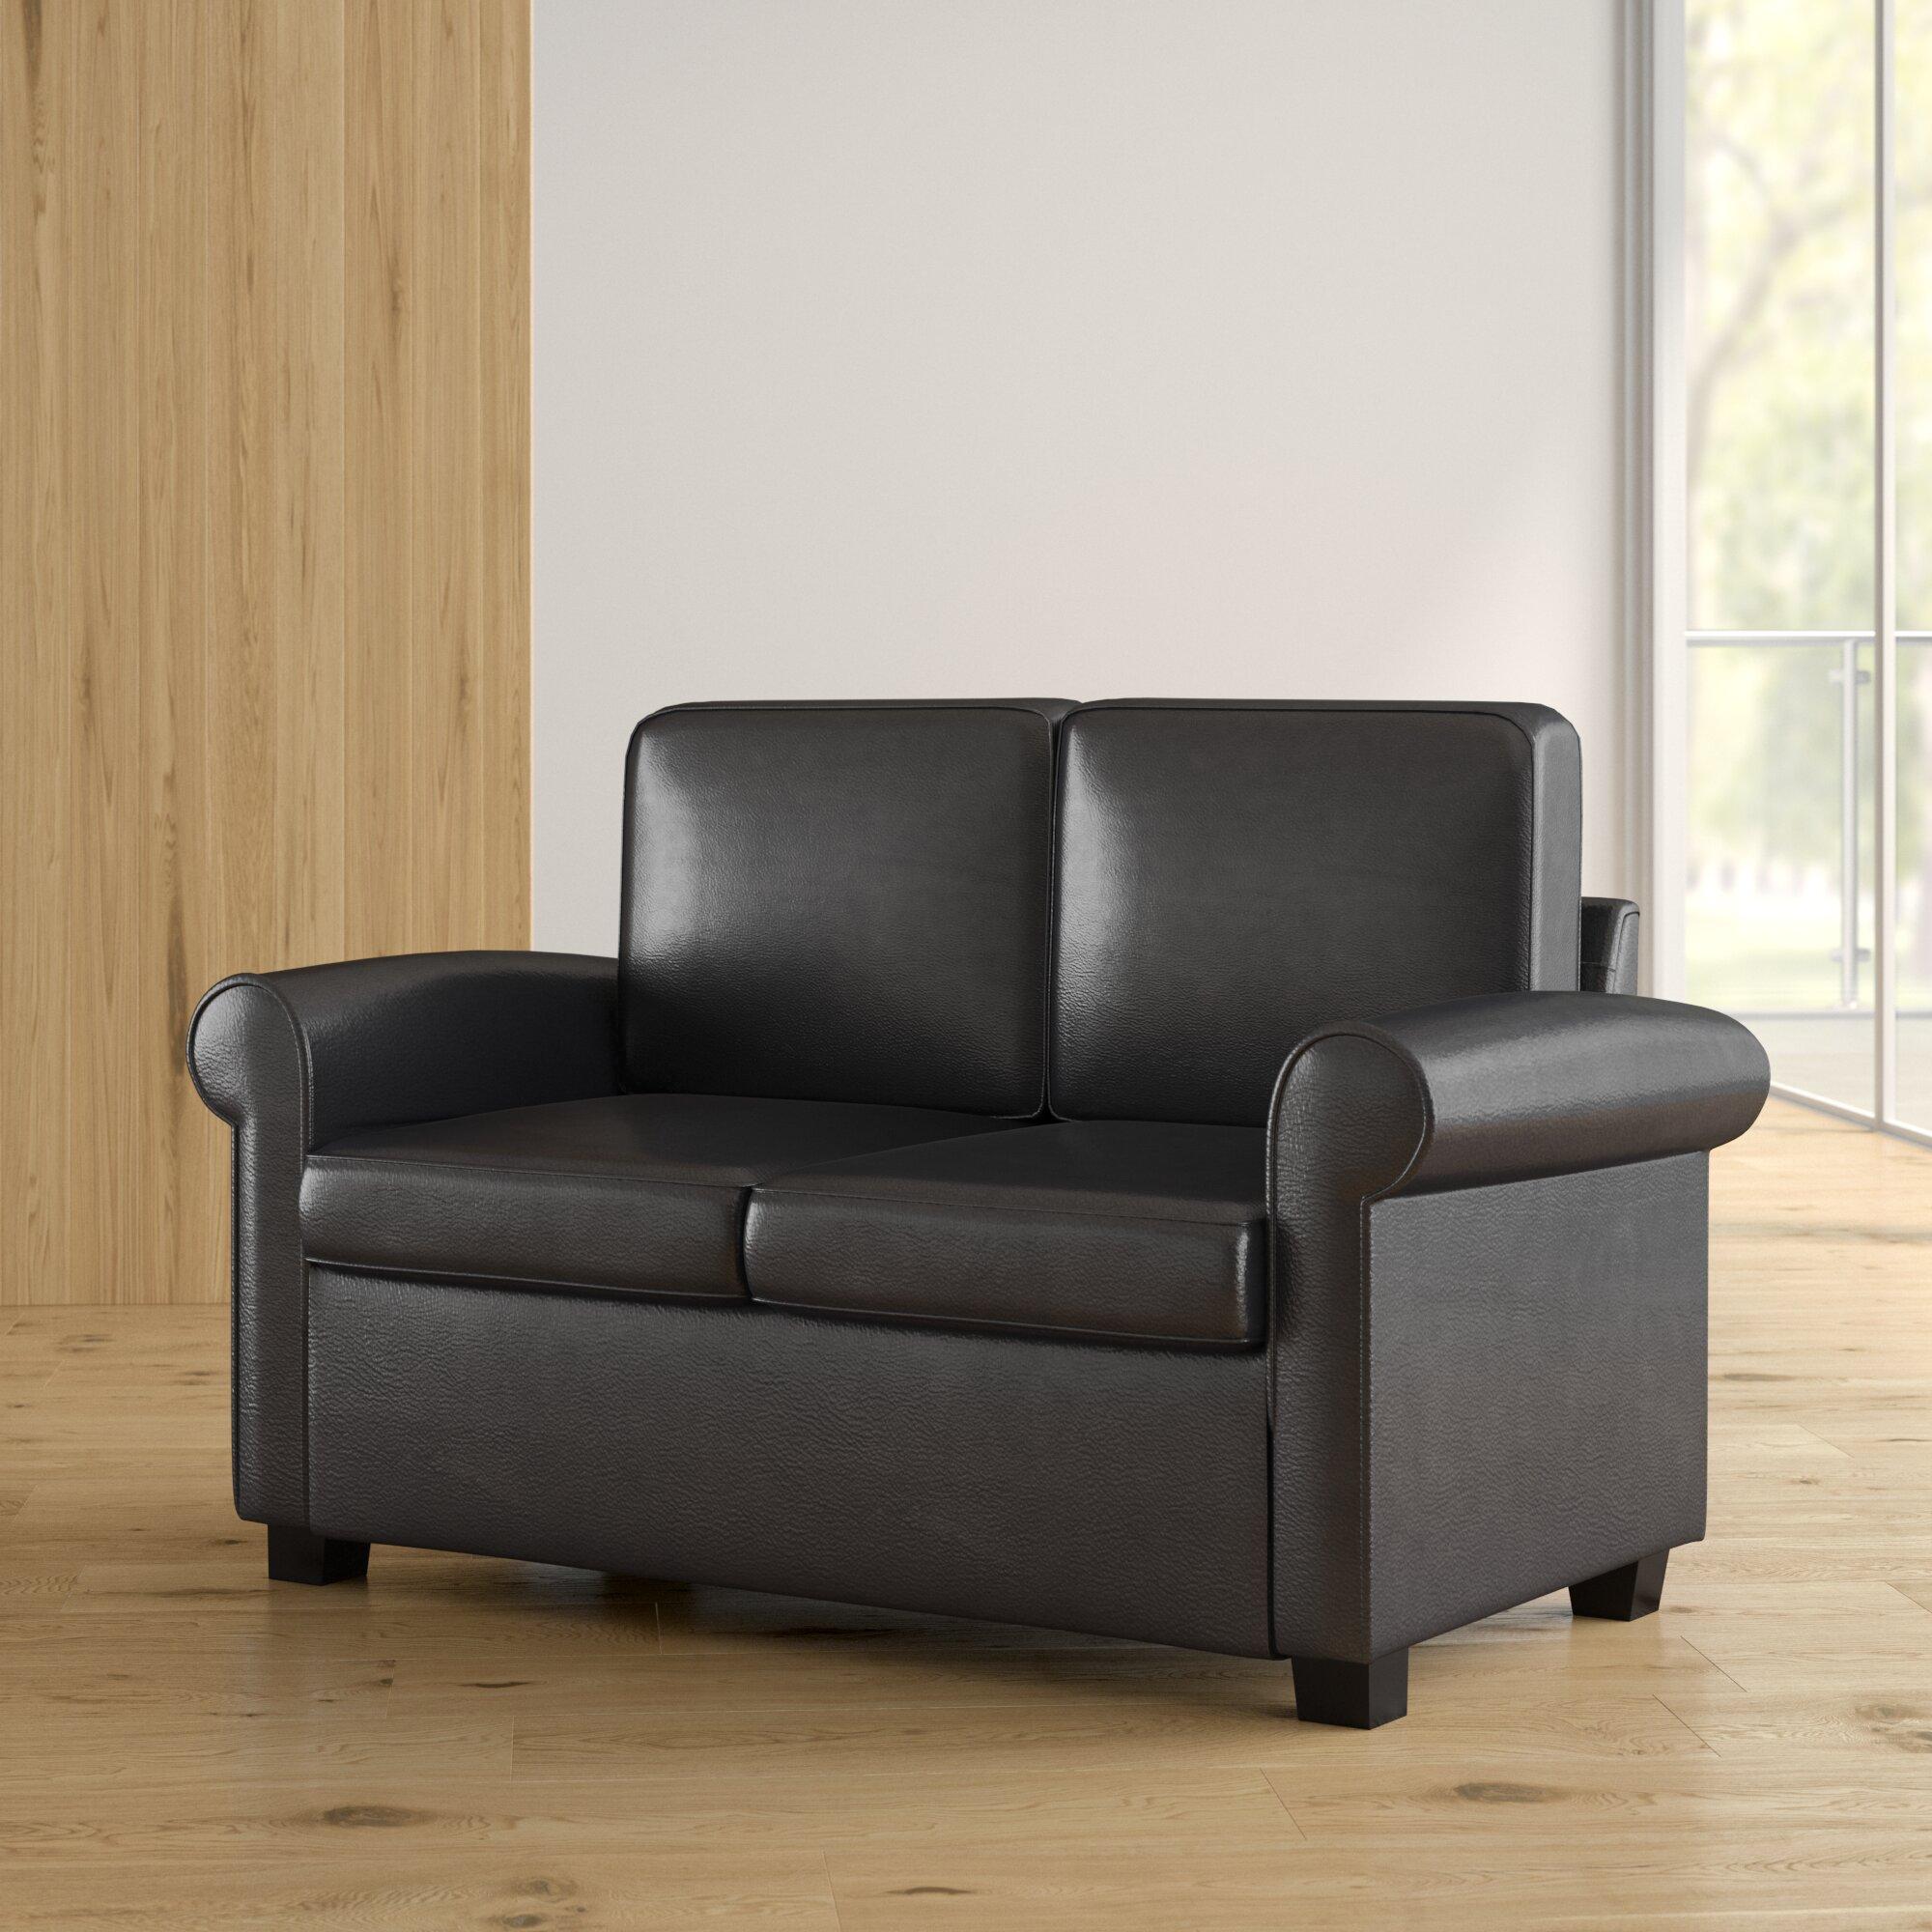 Ebern Designs Ahumada Sofa Bed & Reviews | Wayfair